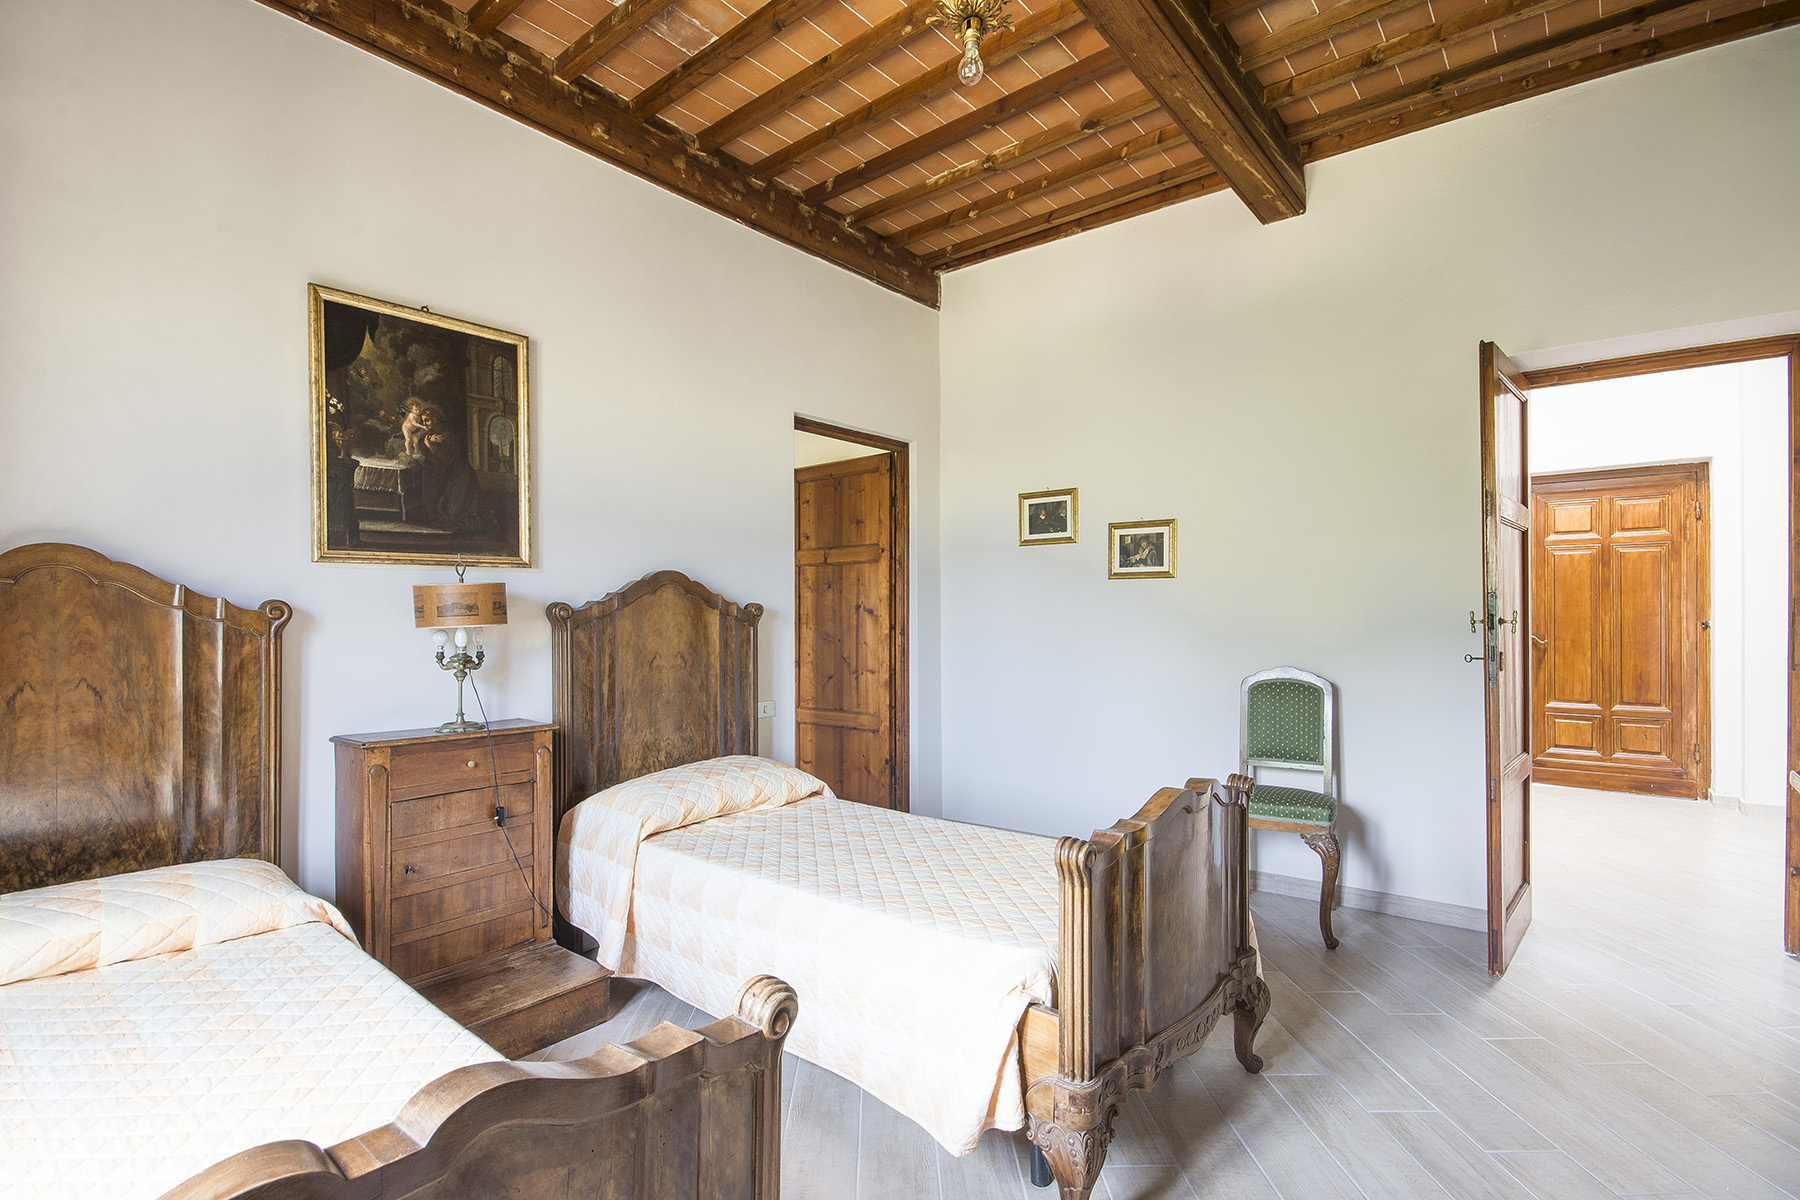 Villa in Vendita a Lucca: 5 locali, 1150 mq - Foto 26